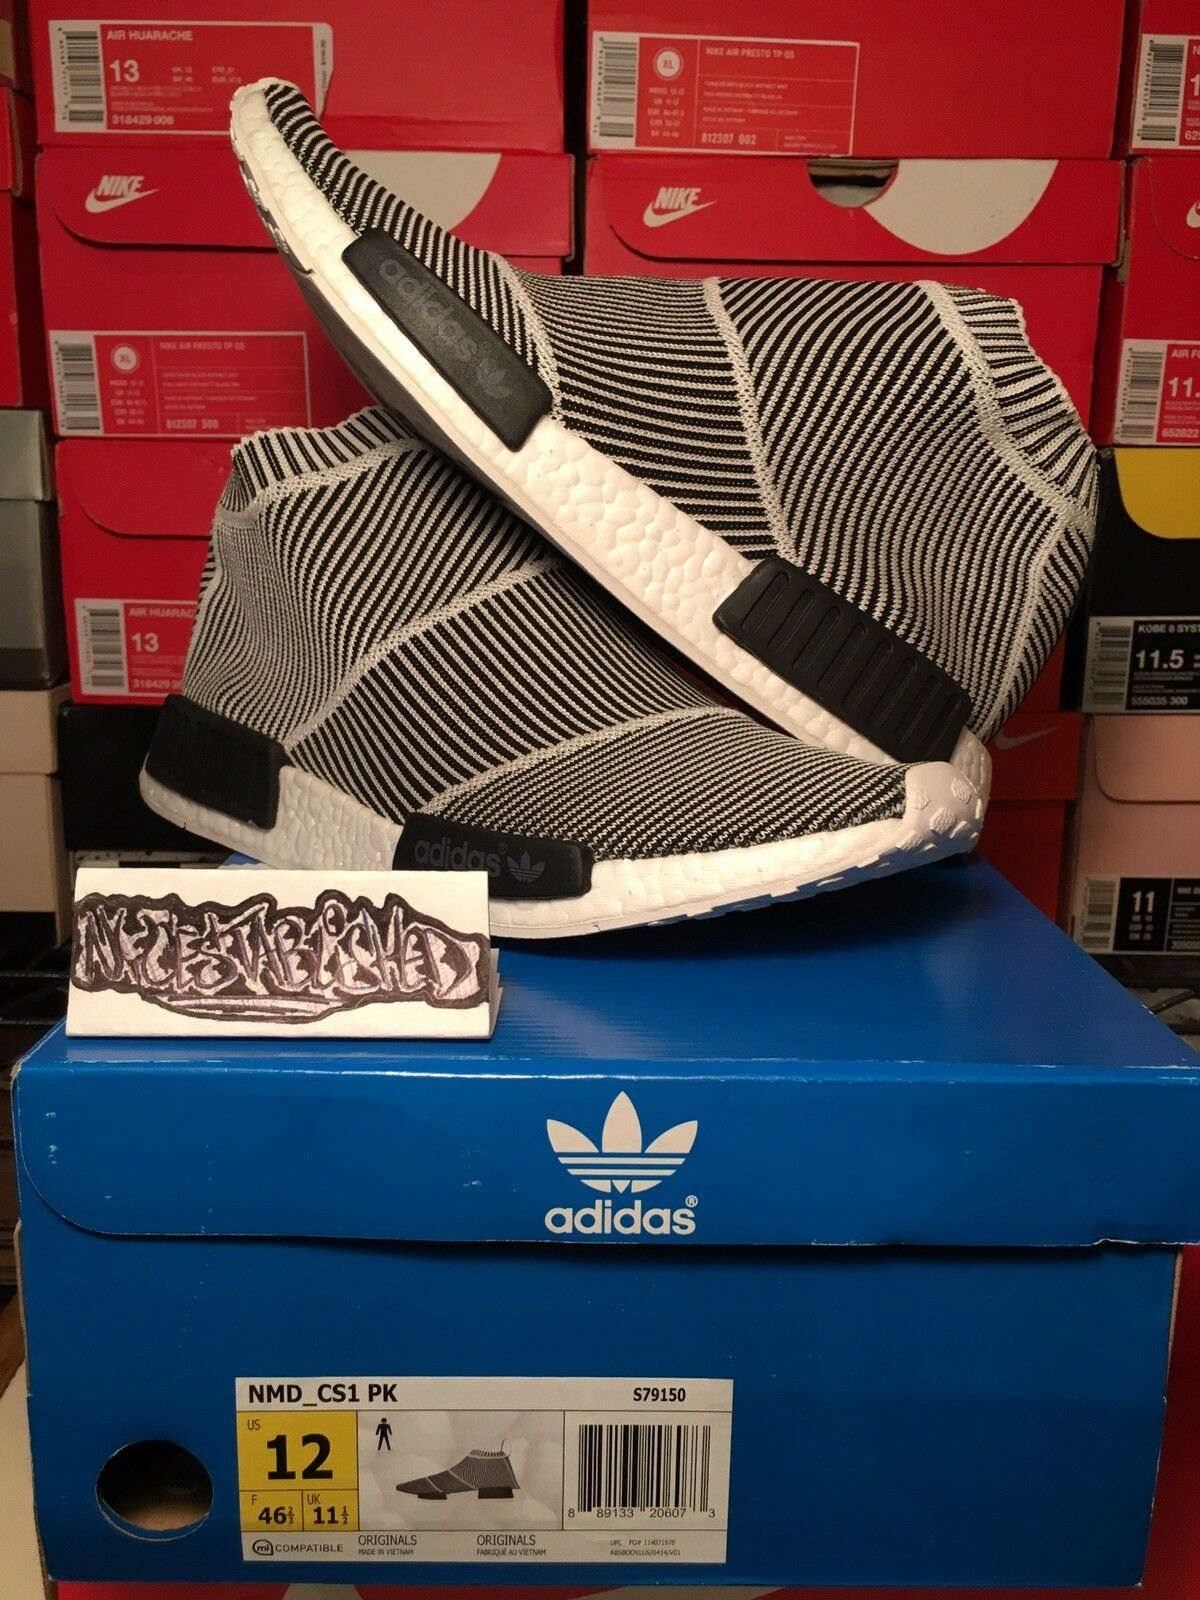 Adidas NMD CS1 PK OG Size12